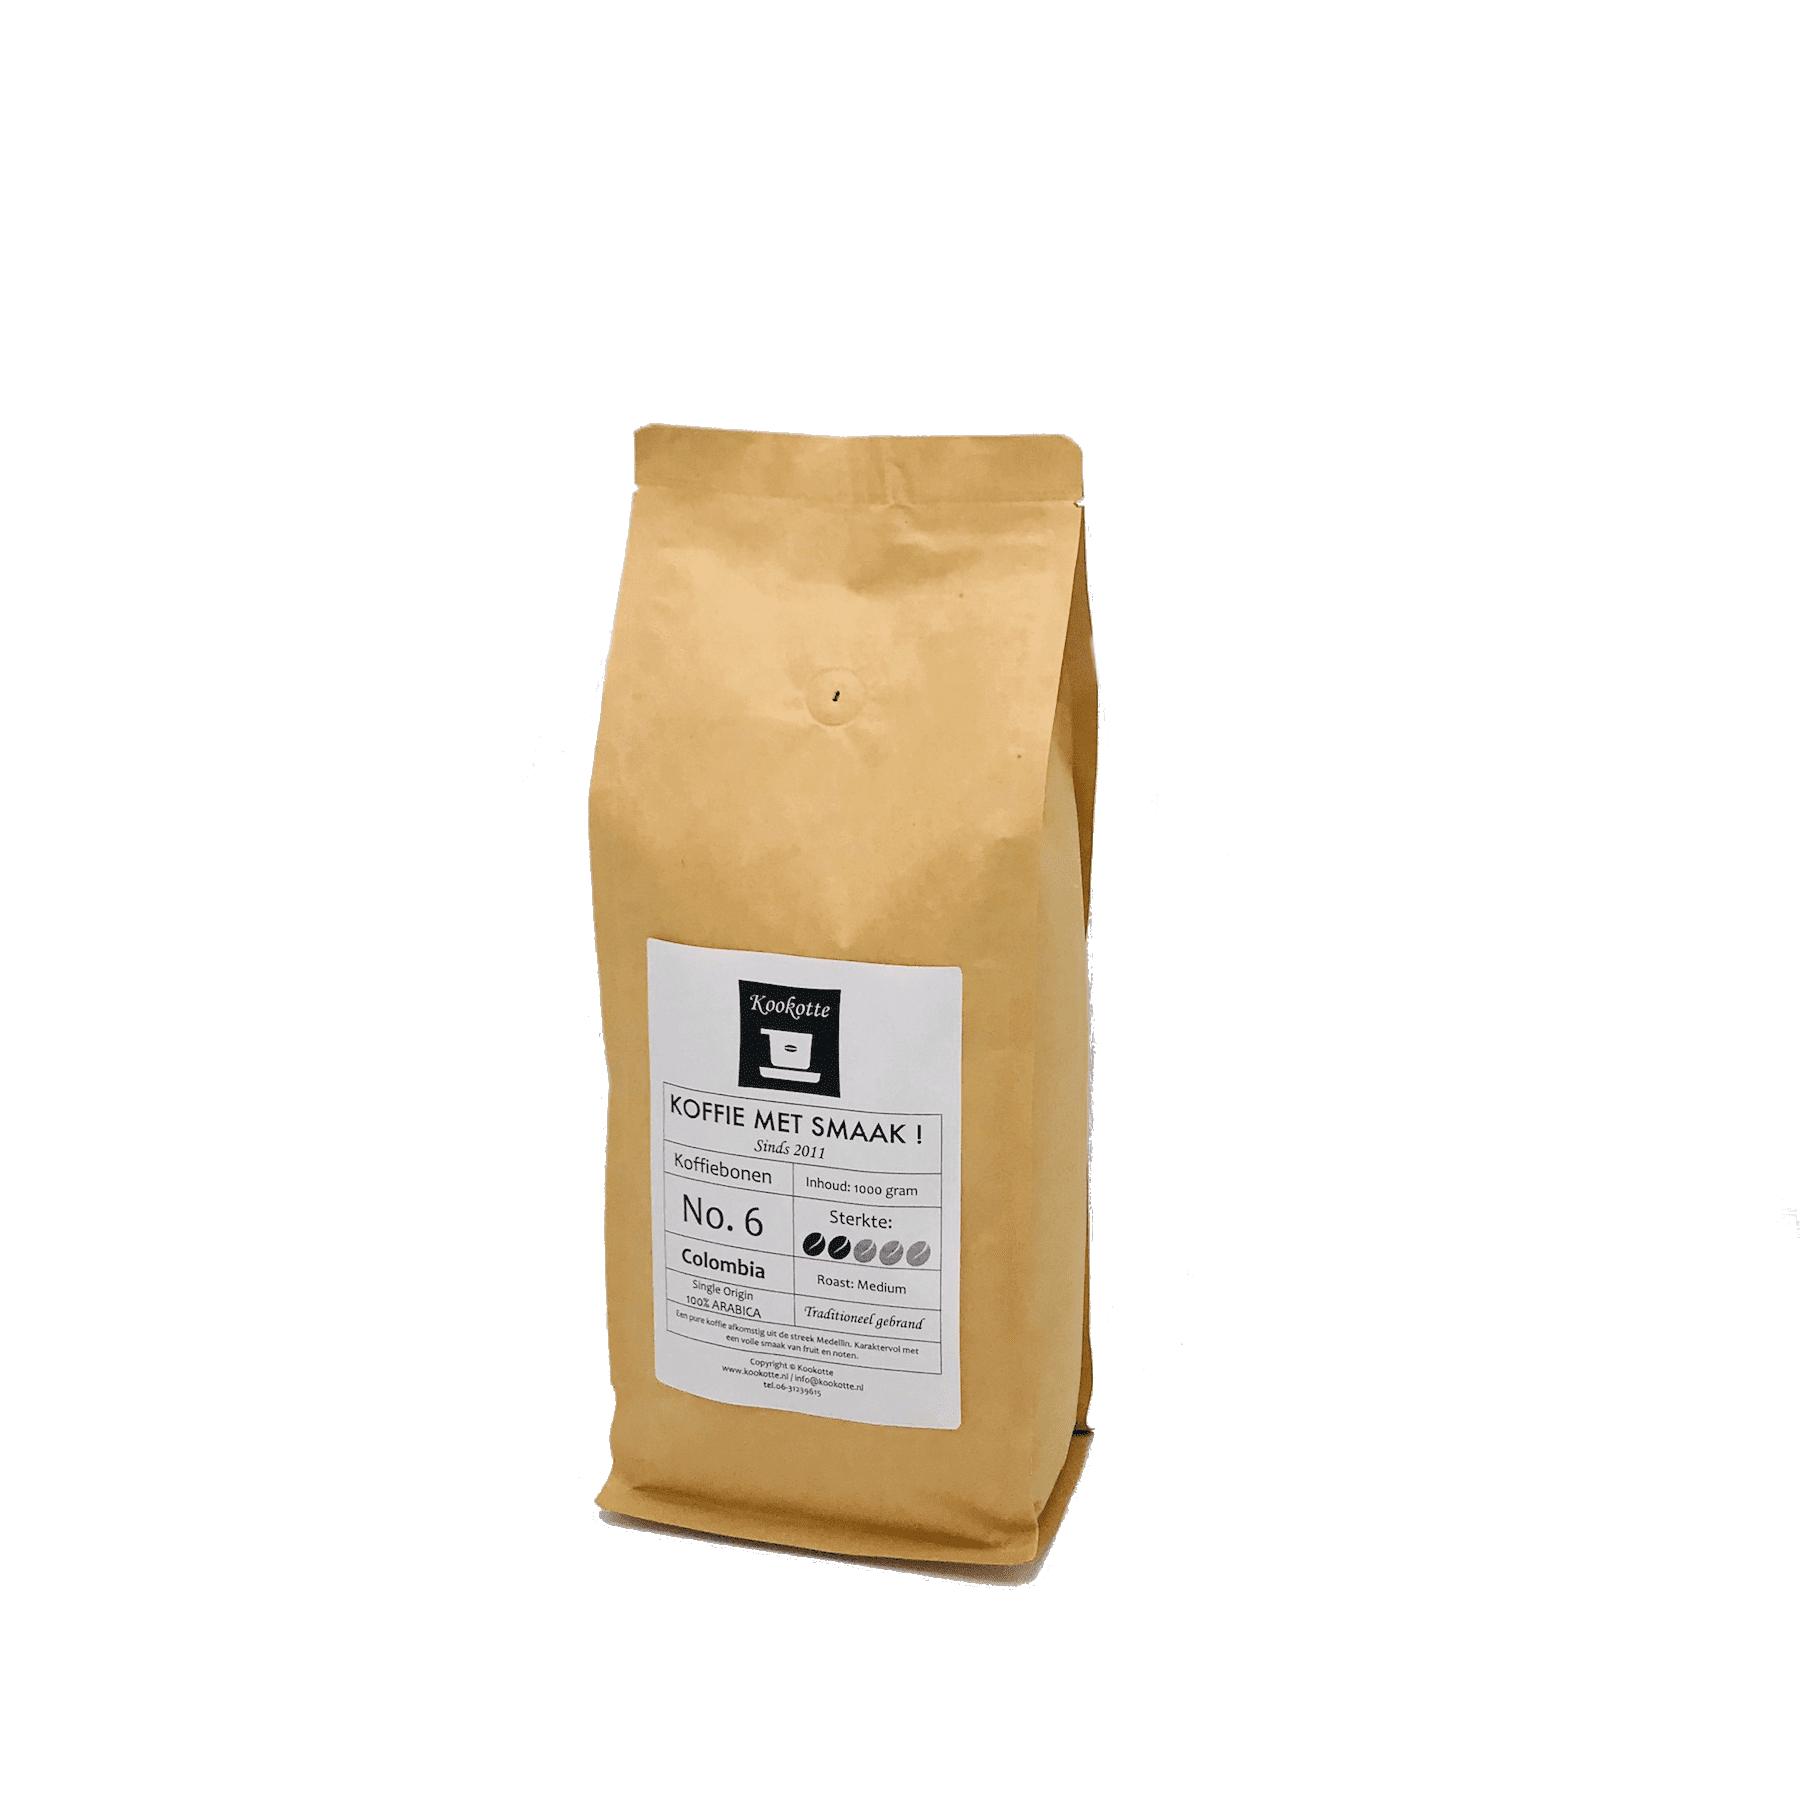 Koffiebonen No.6